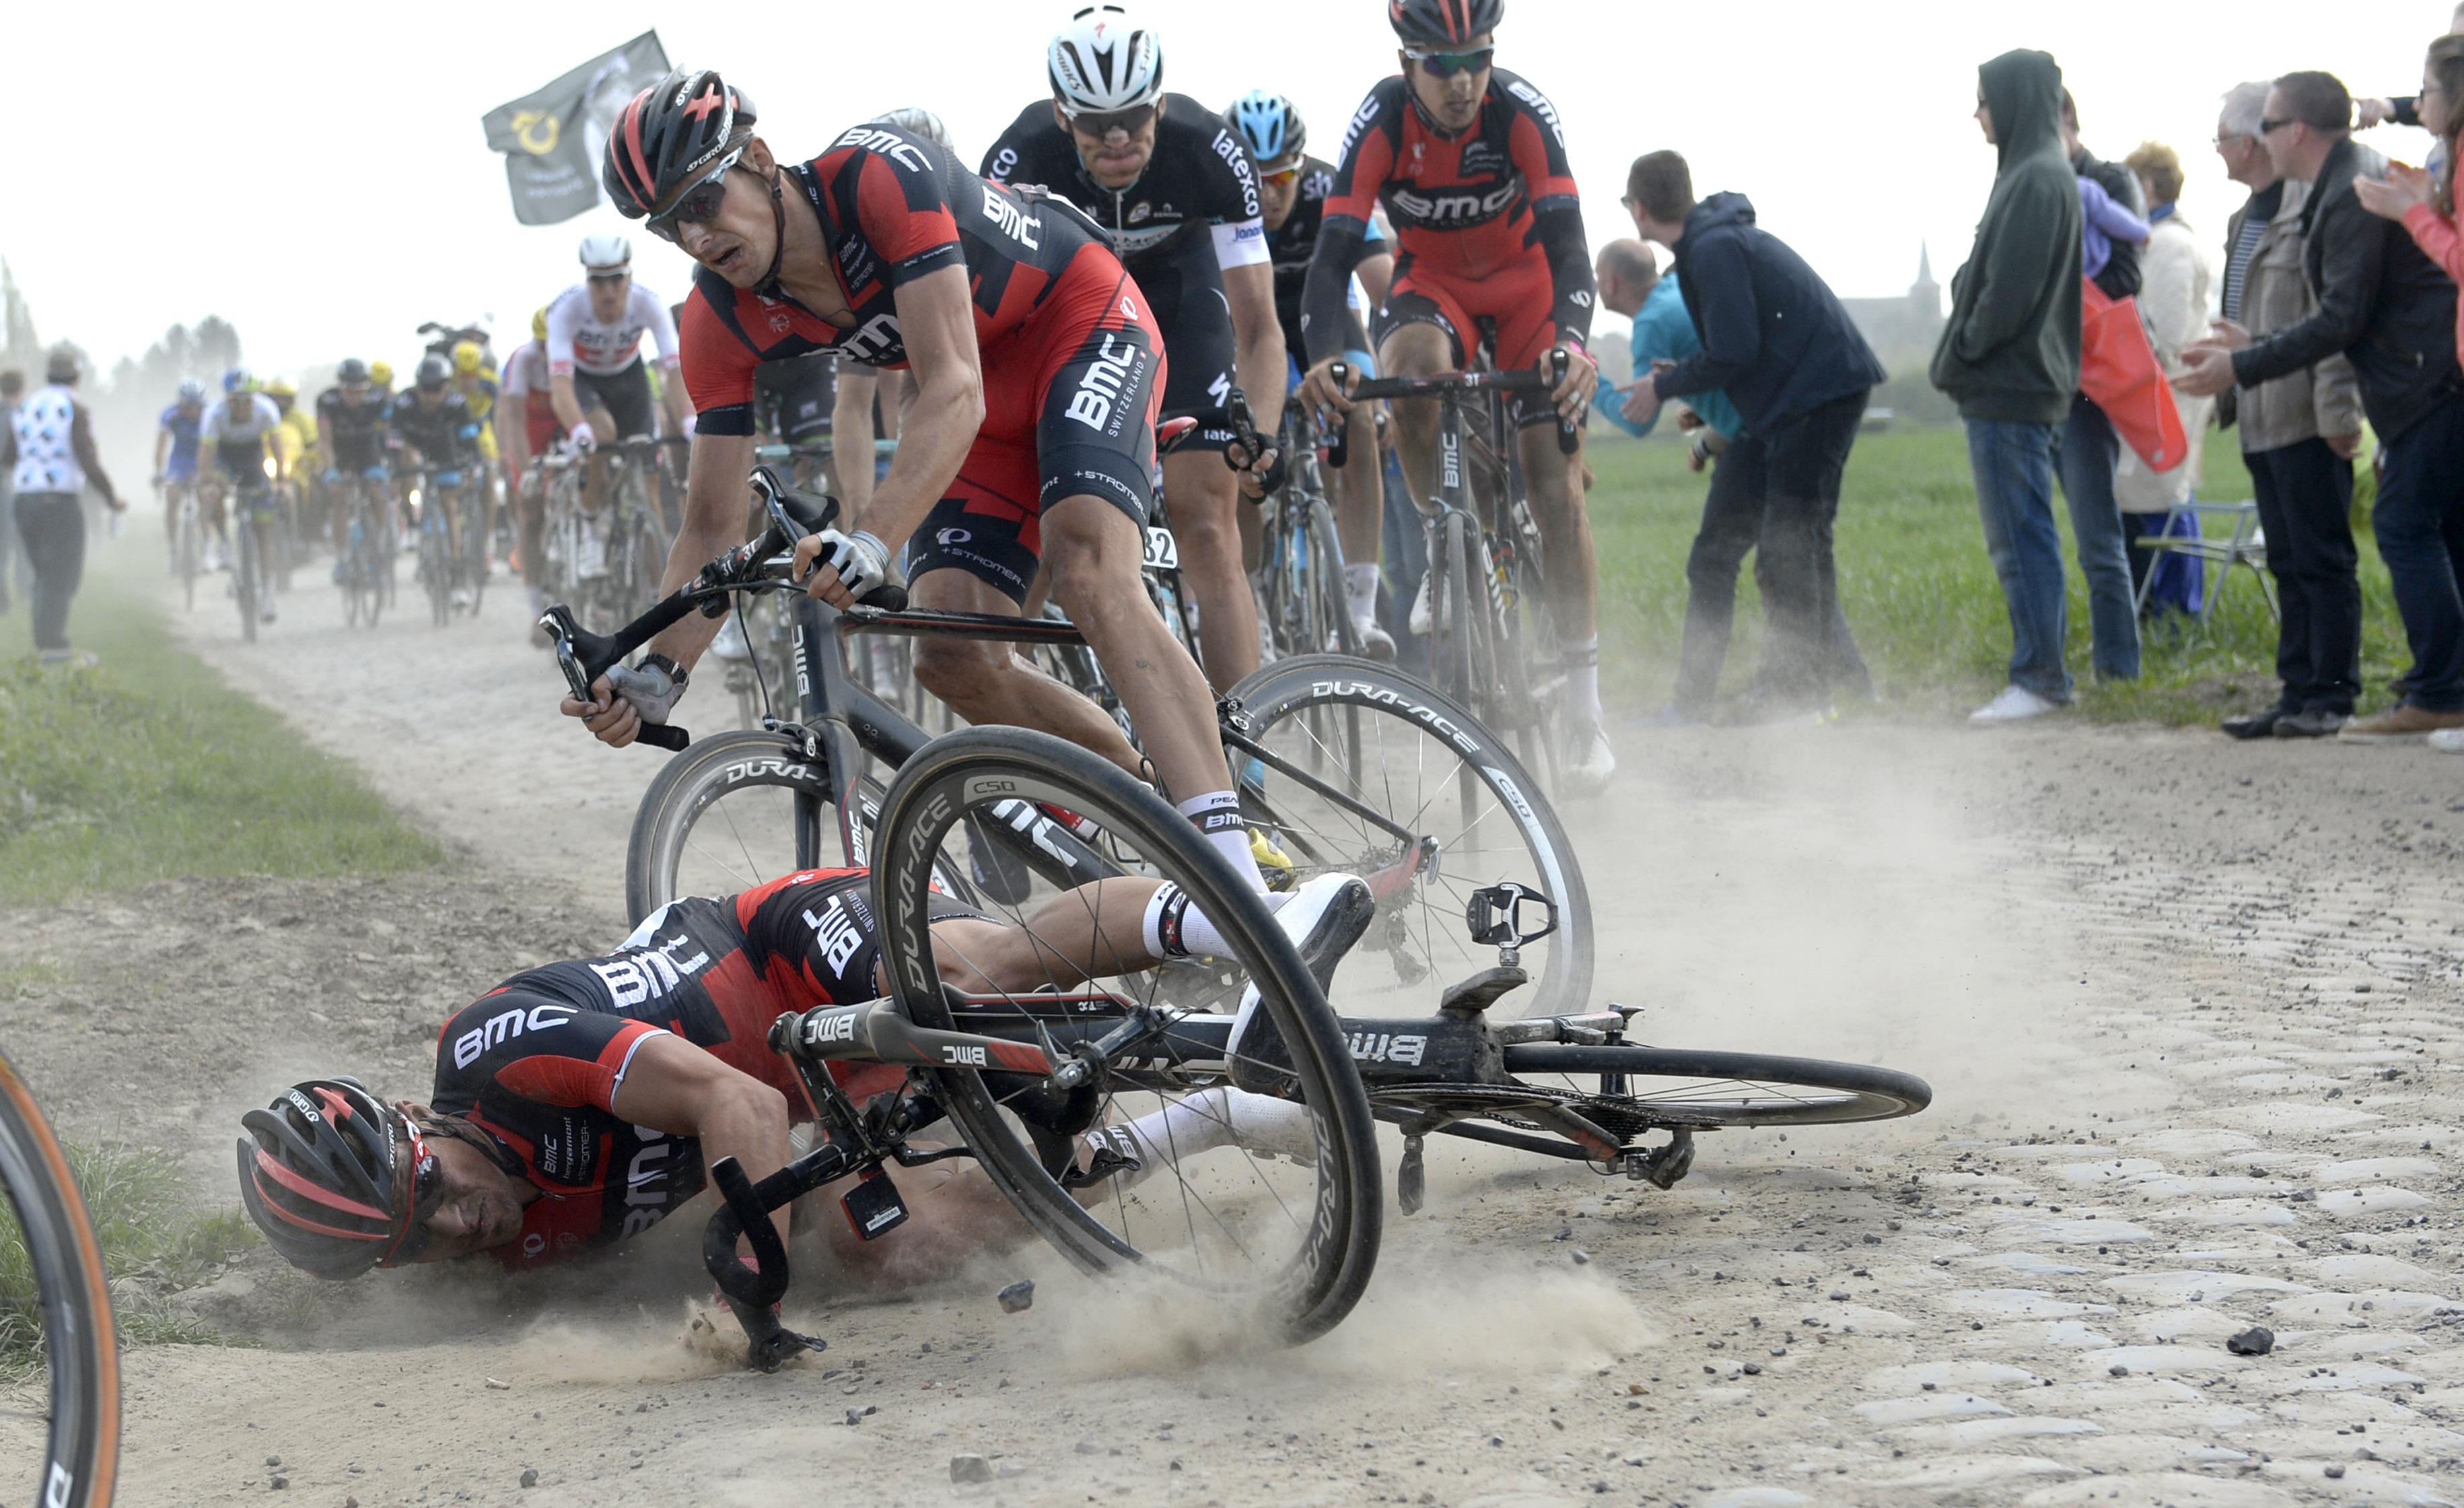 París Roubaix